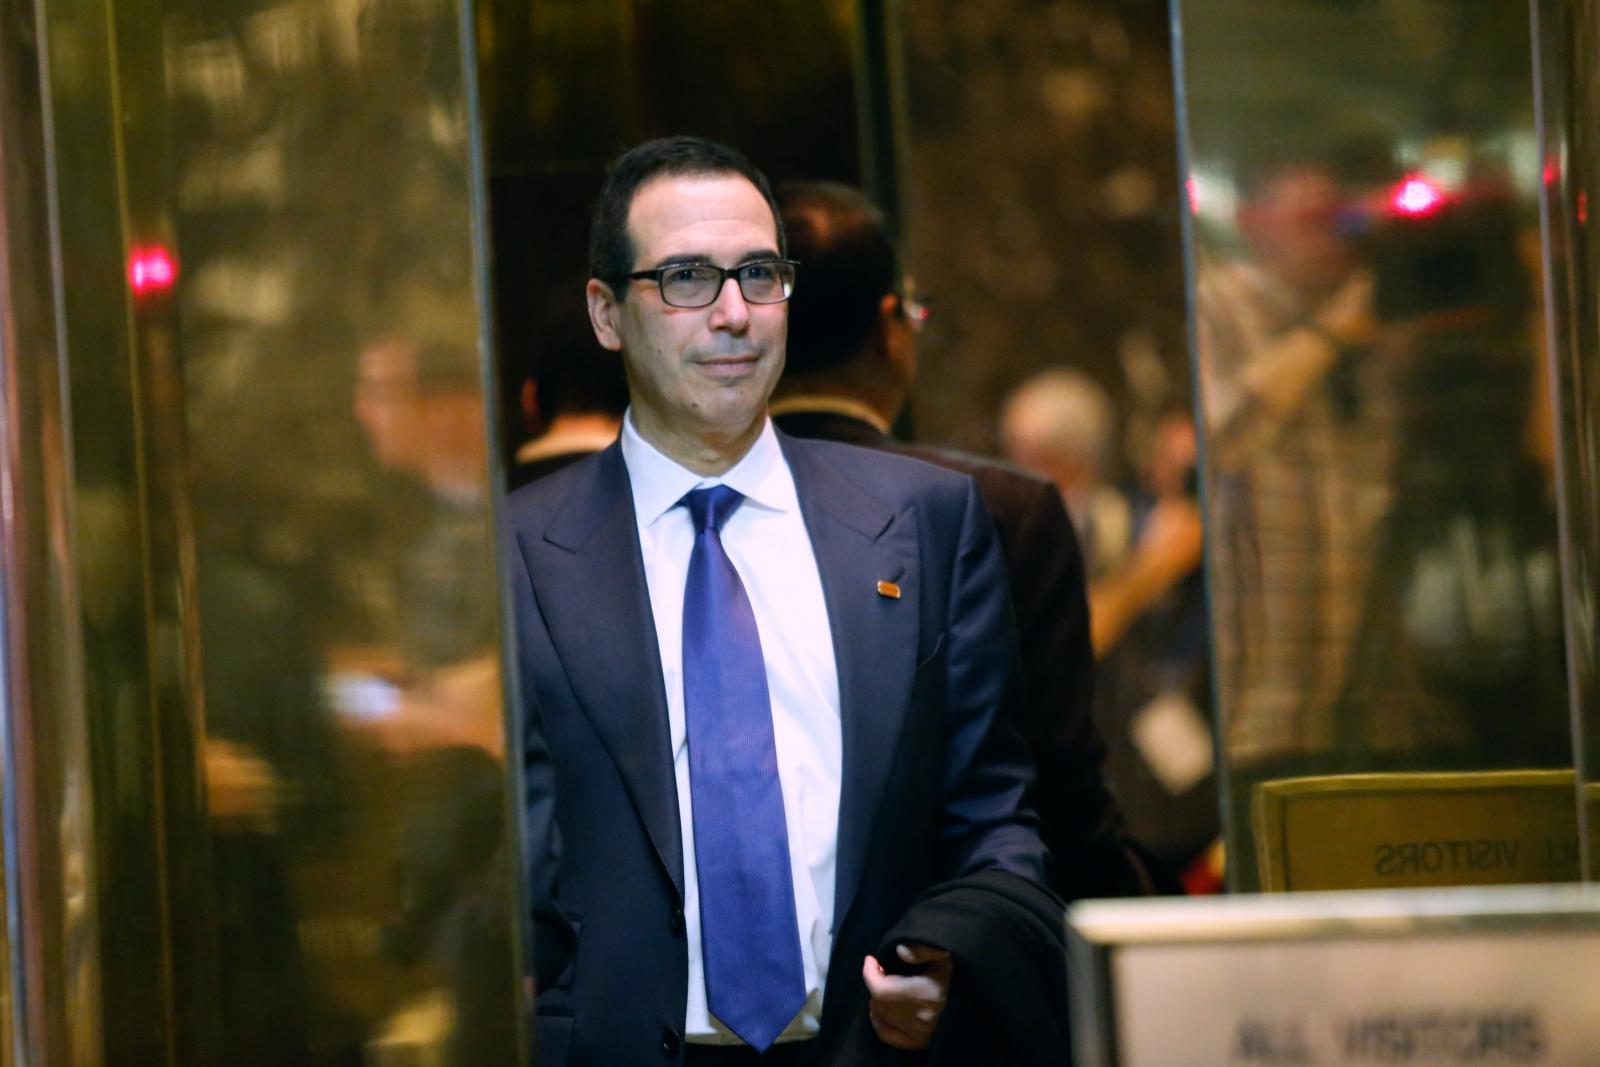 news world americas donald trump treasury secretary steven mnuchin goldman sachs hollywood